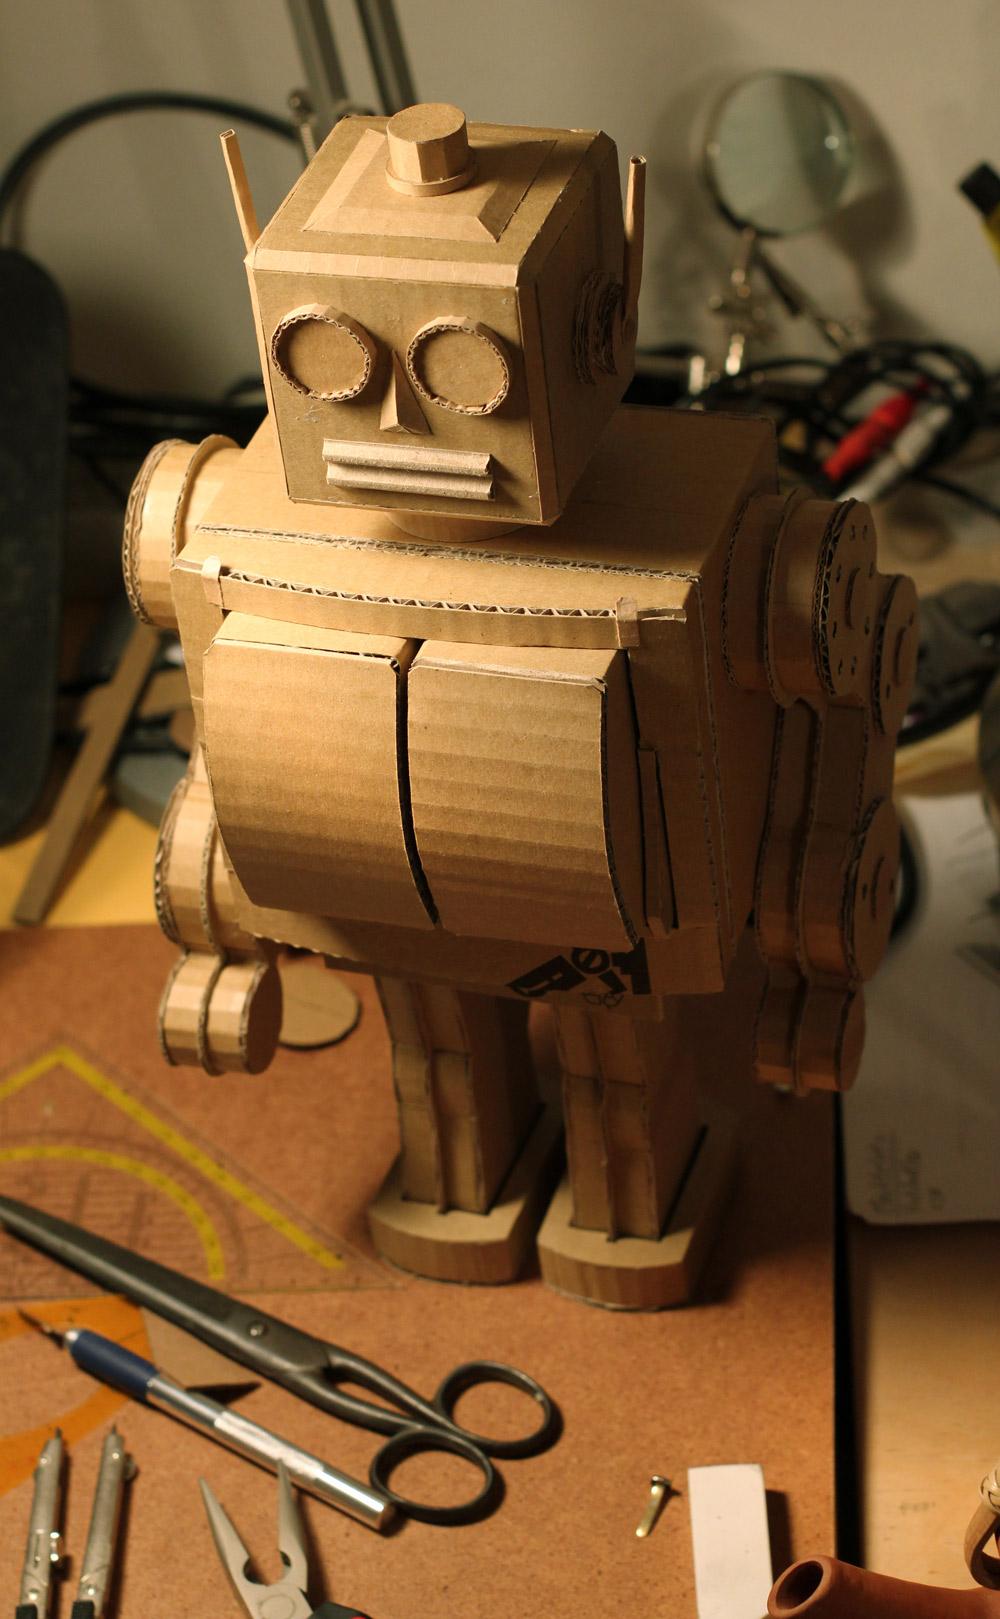 Kartonroboter